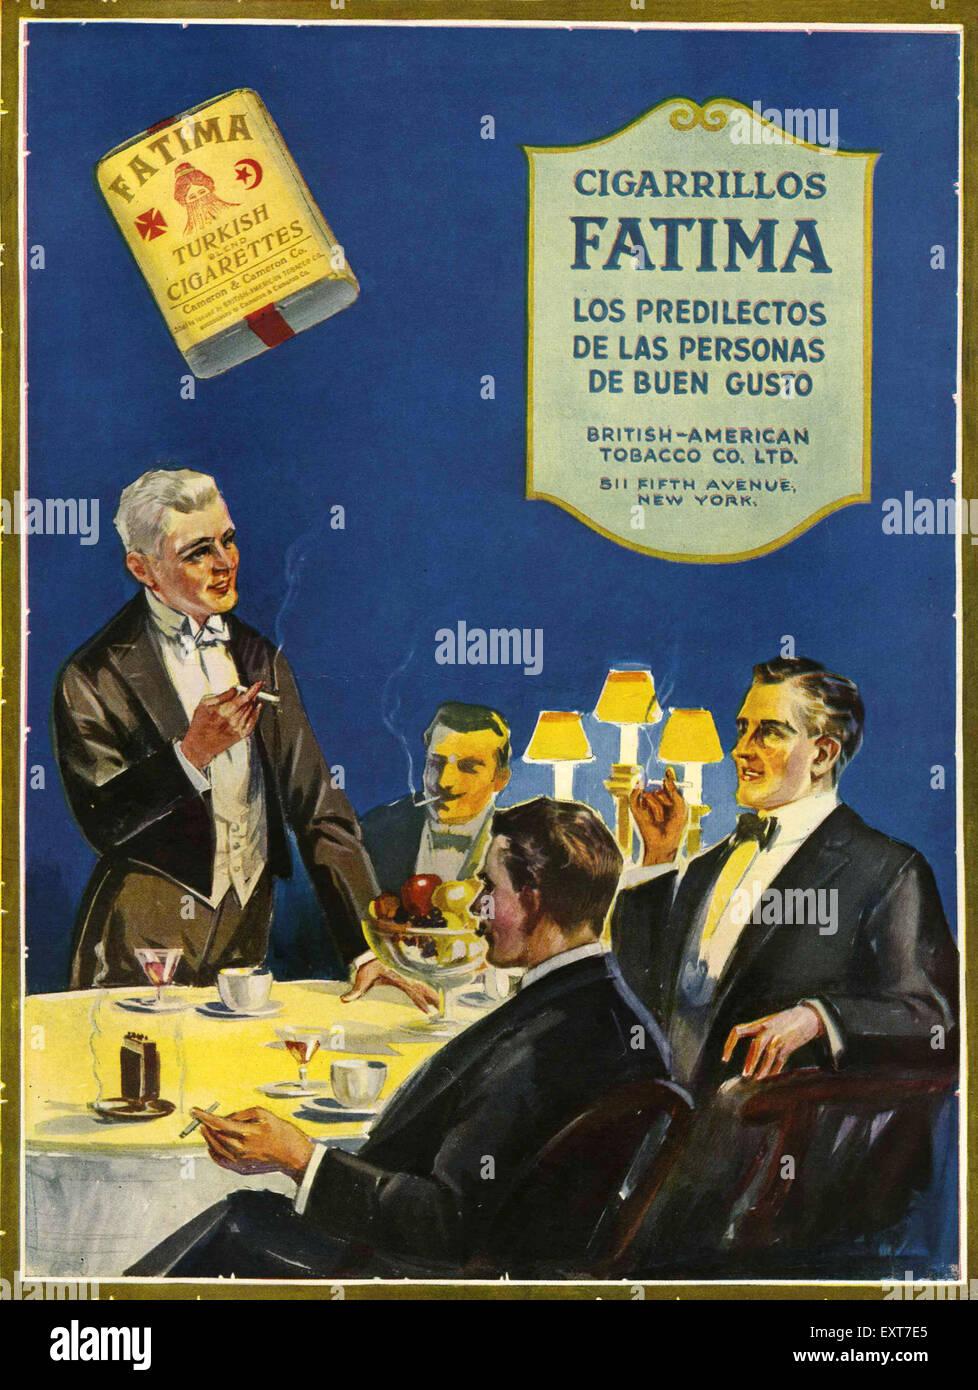 1930s Spain Fatima Magazine Advert - Stock Image